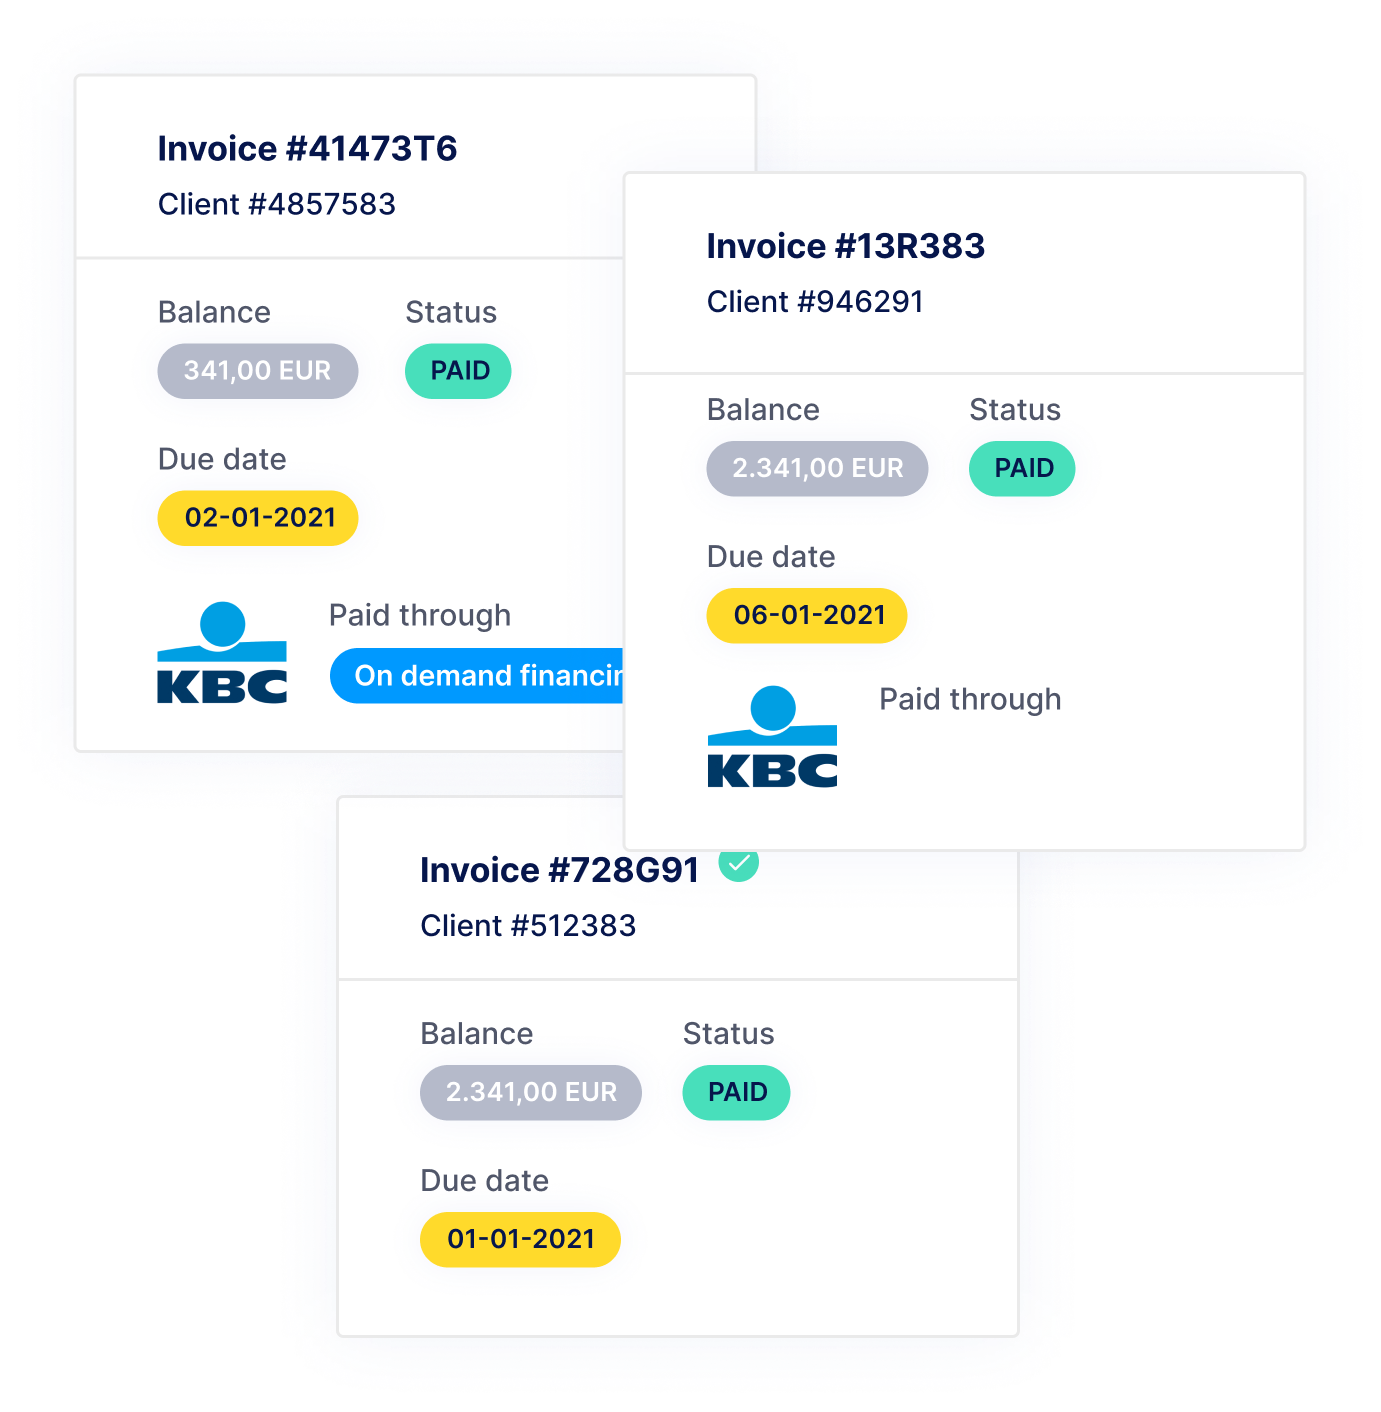 on demand financing